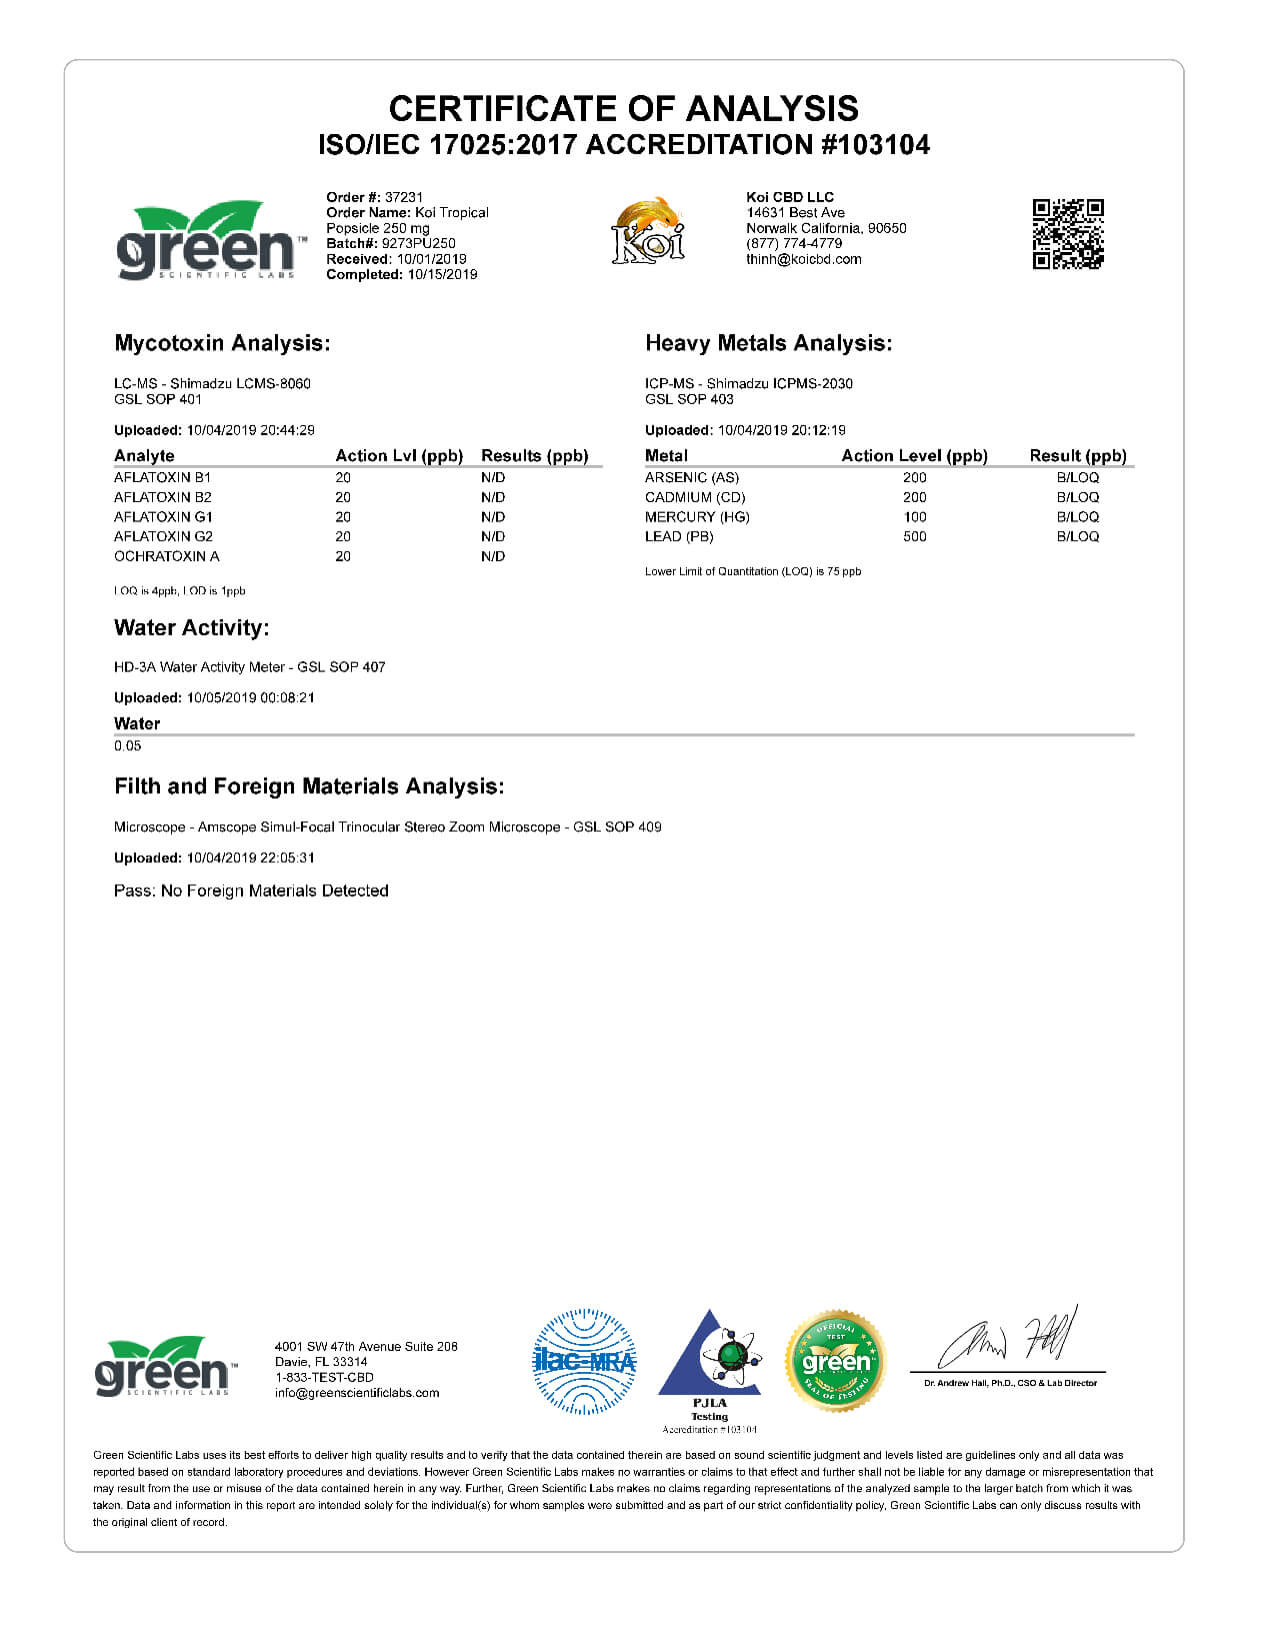 Koi CBD Tropical Popsicle Vape Oil 250mg page6